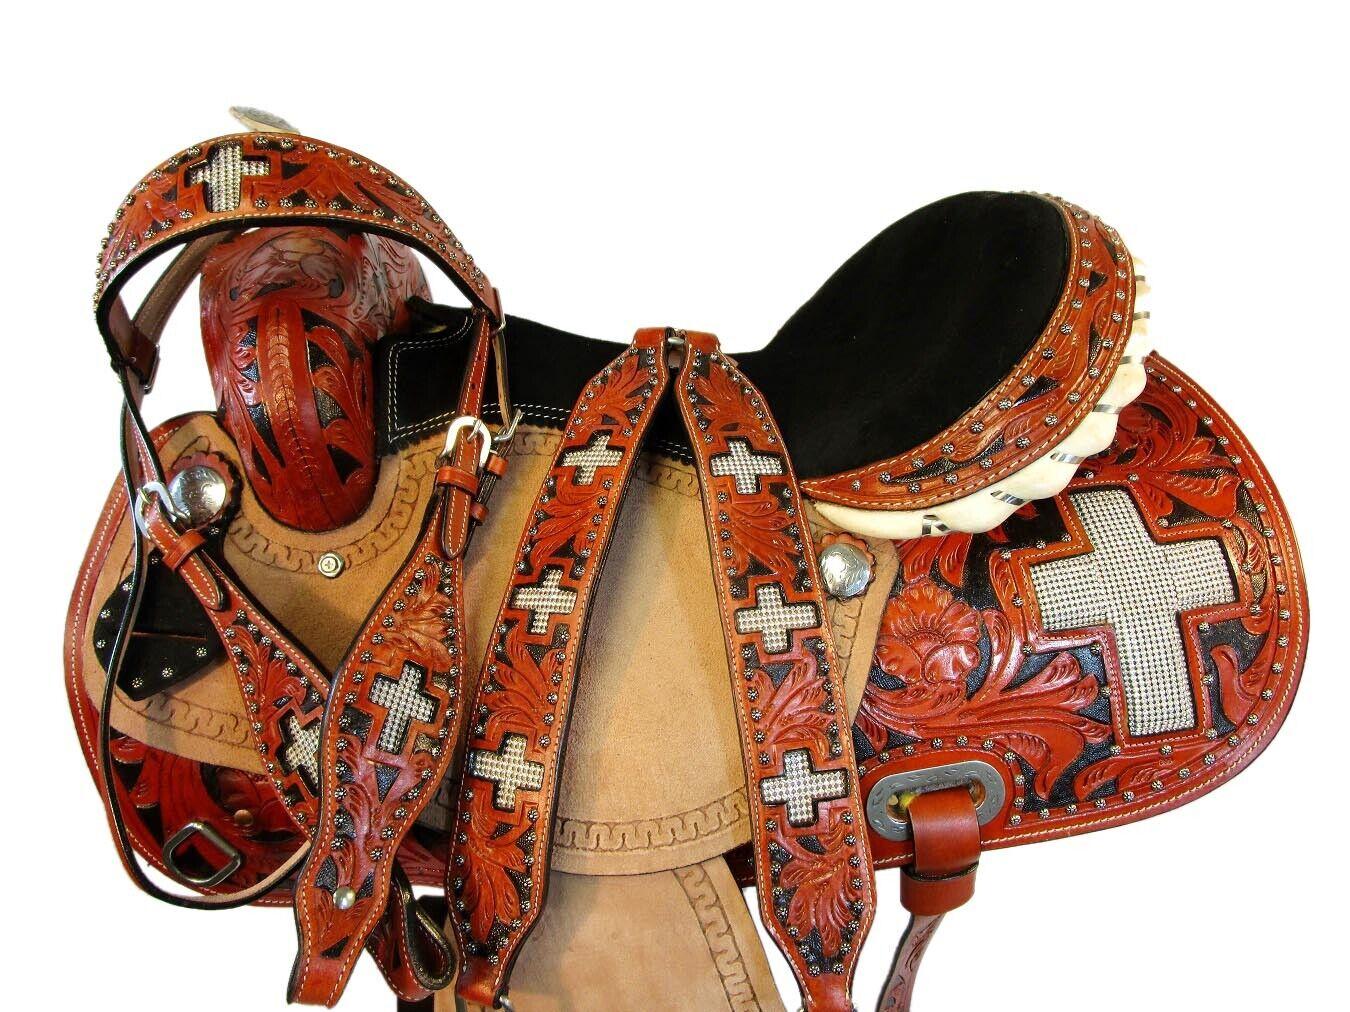 WESTERN COWBOY CROSS DIAMOND PLEASURE FLORAL strumentoED BARREL RACING SADDLE 15 16